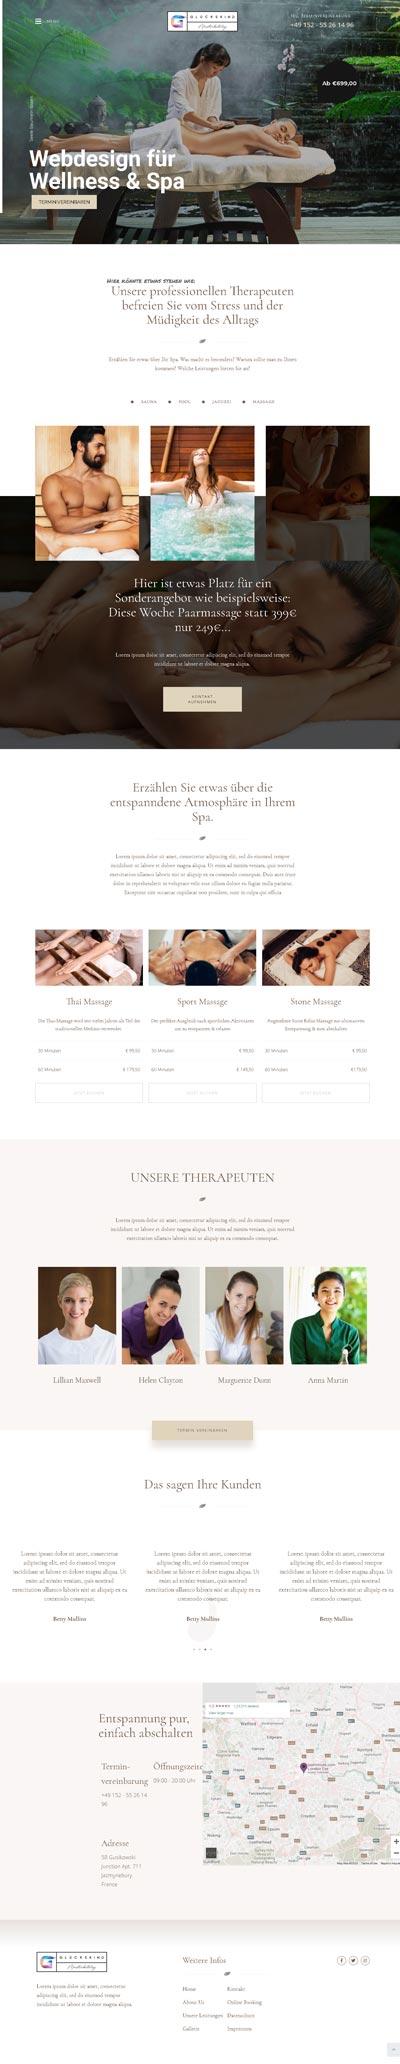 Spa Relax - Glückskind Webdesign Musterkatalog